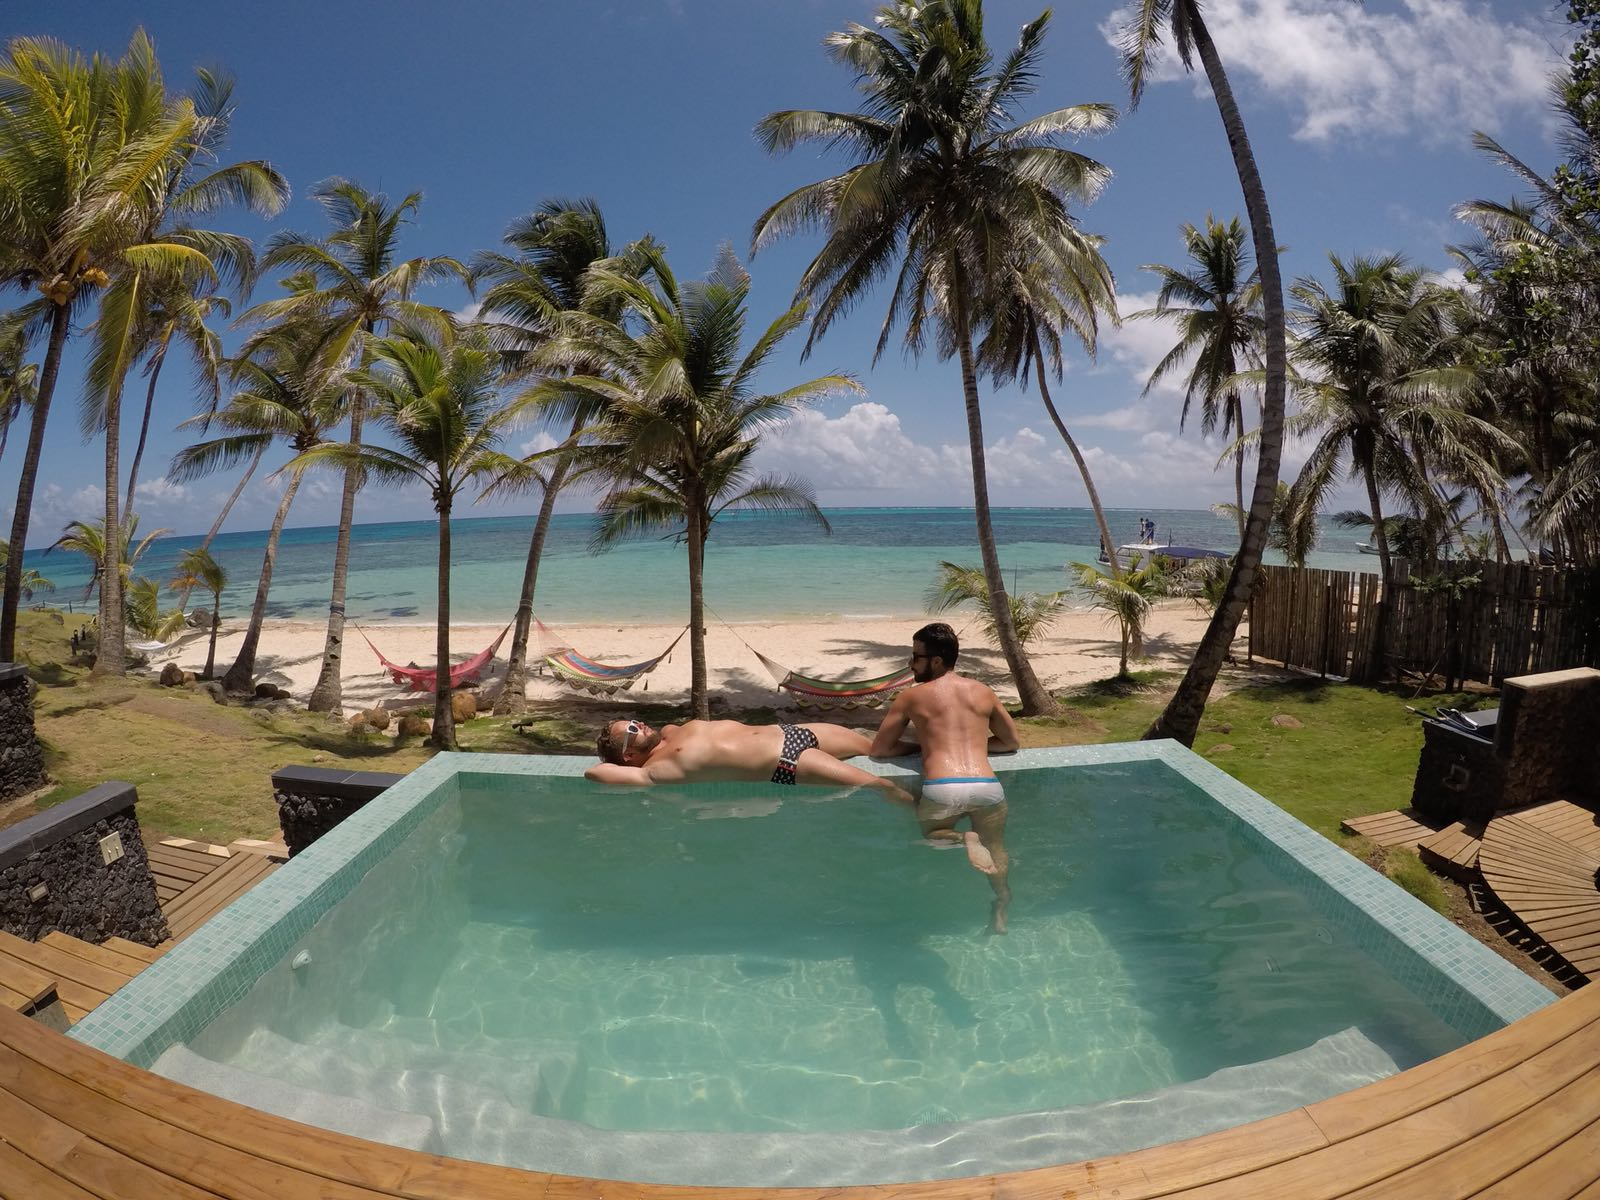 Gay Friendly Hotels Nicaragua: Yemaya Island Hideaway and Spa